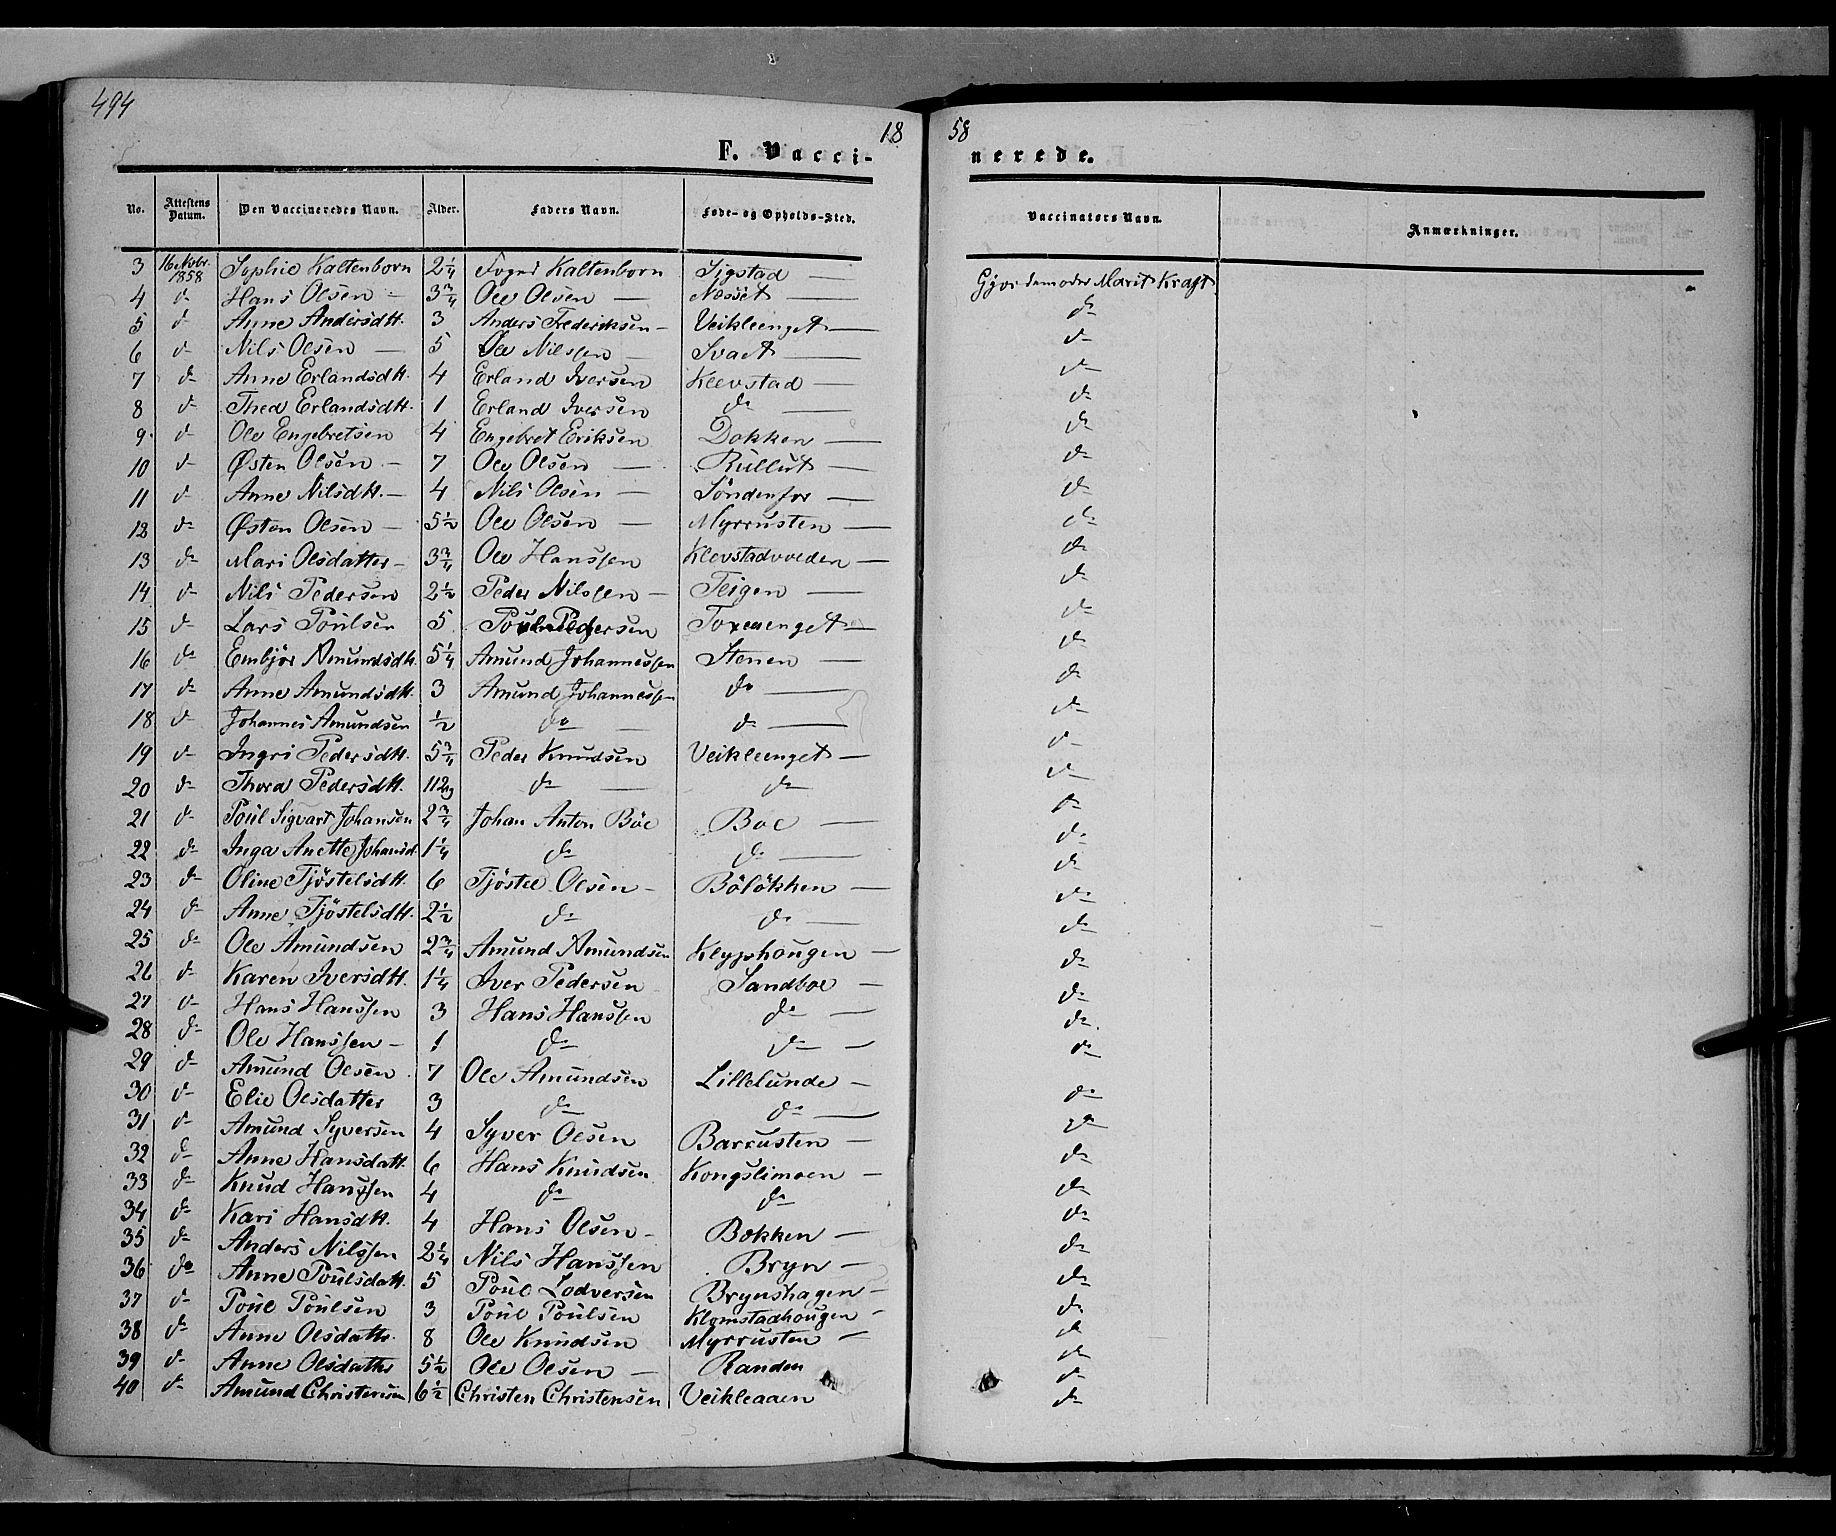 SAH, Nord-Fron prestekontor, Ministerialbok nr. 1, 1851-1864, s. 494